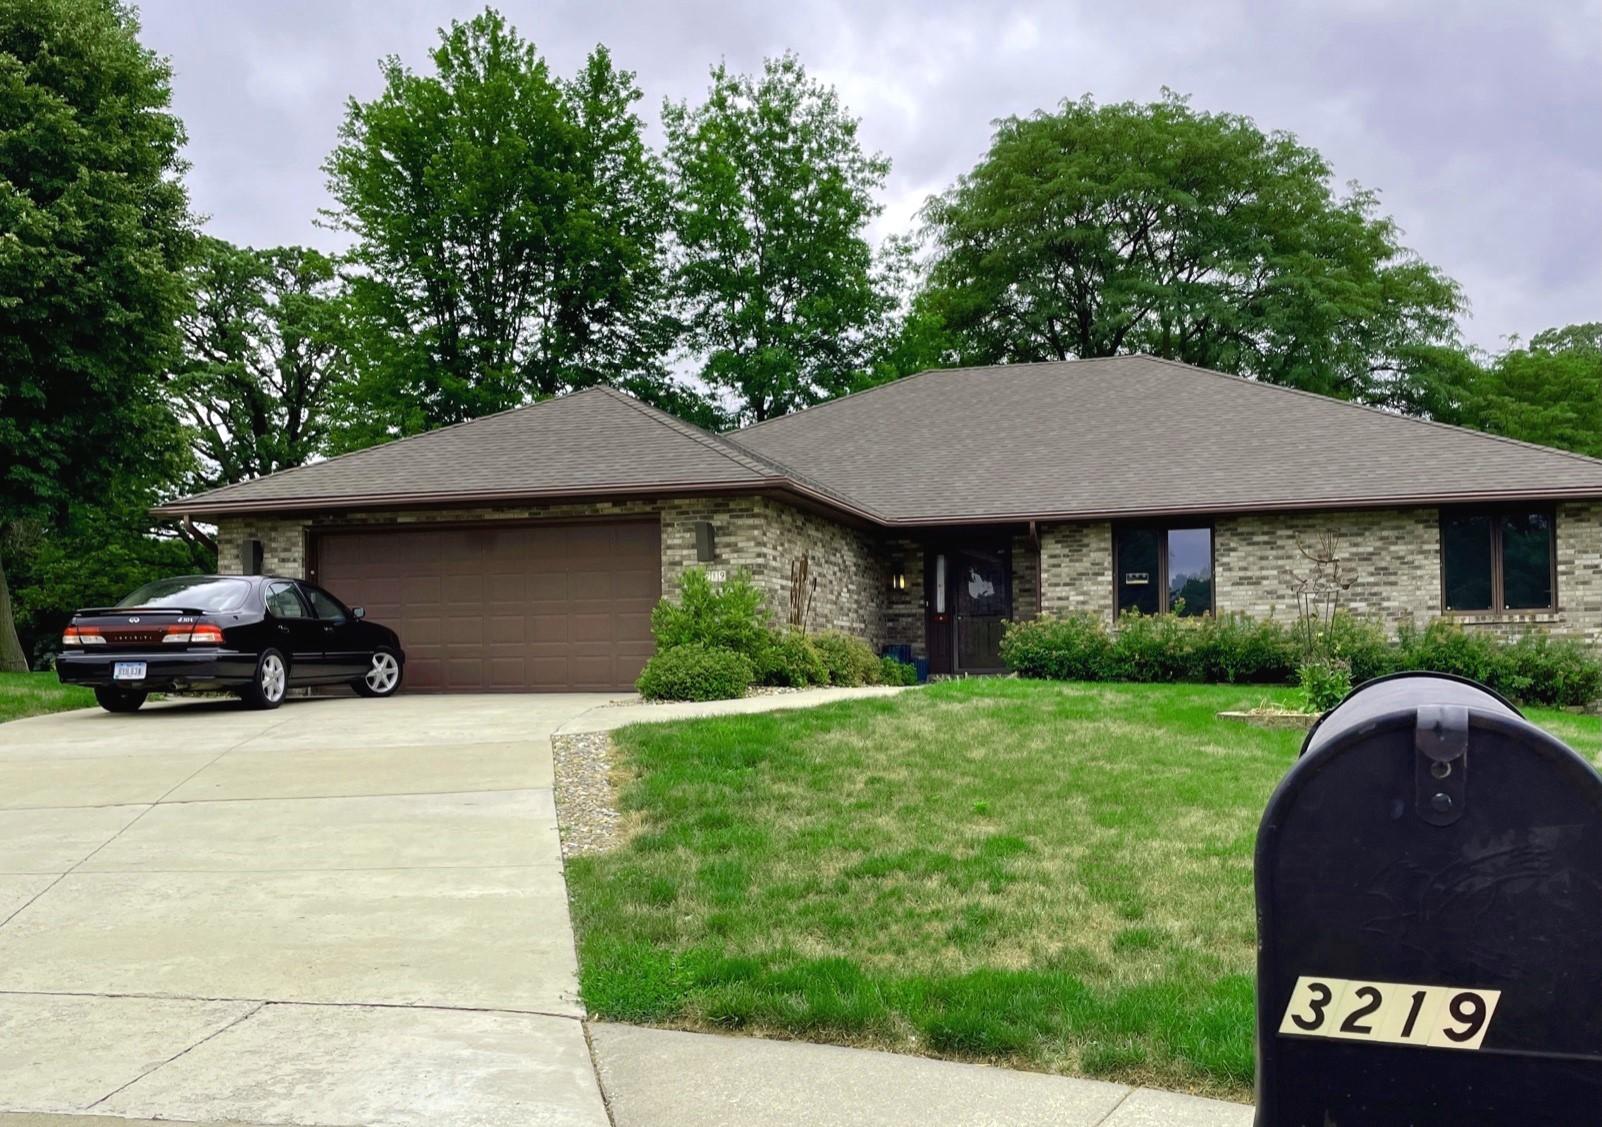 Nurse tells court Des Moines home for the elderly needs no license